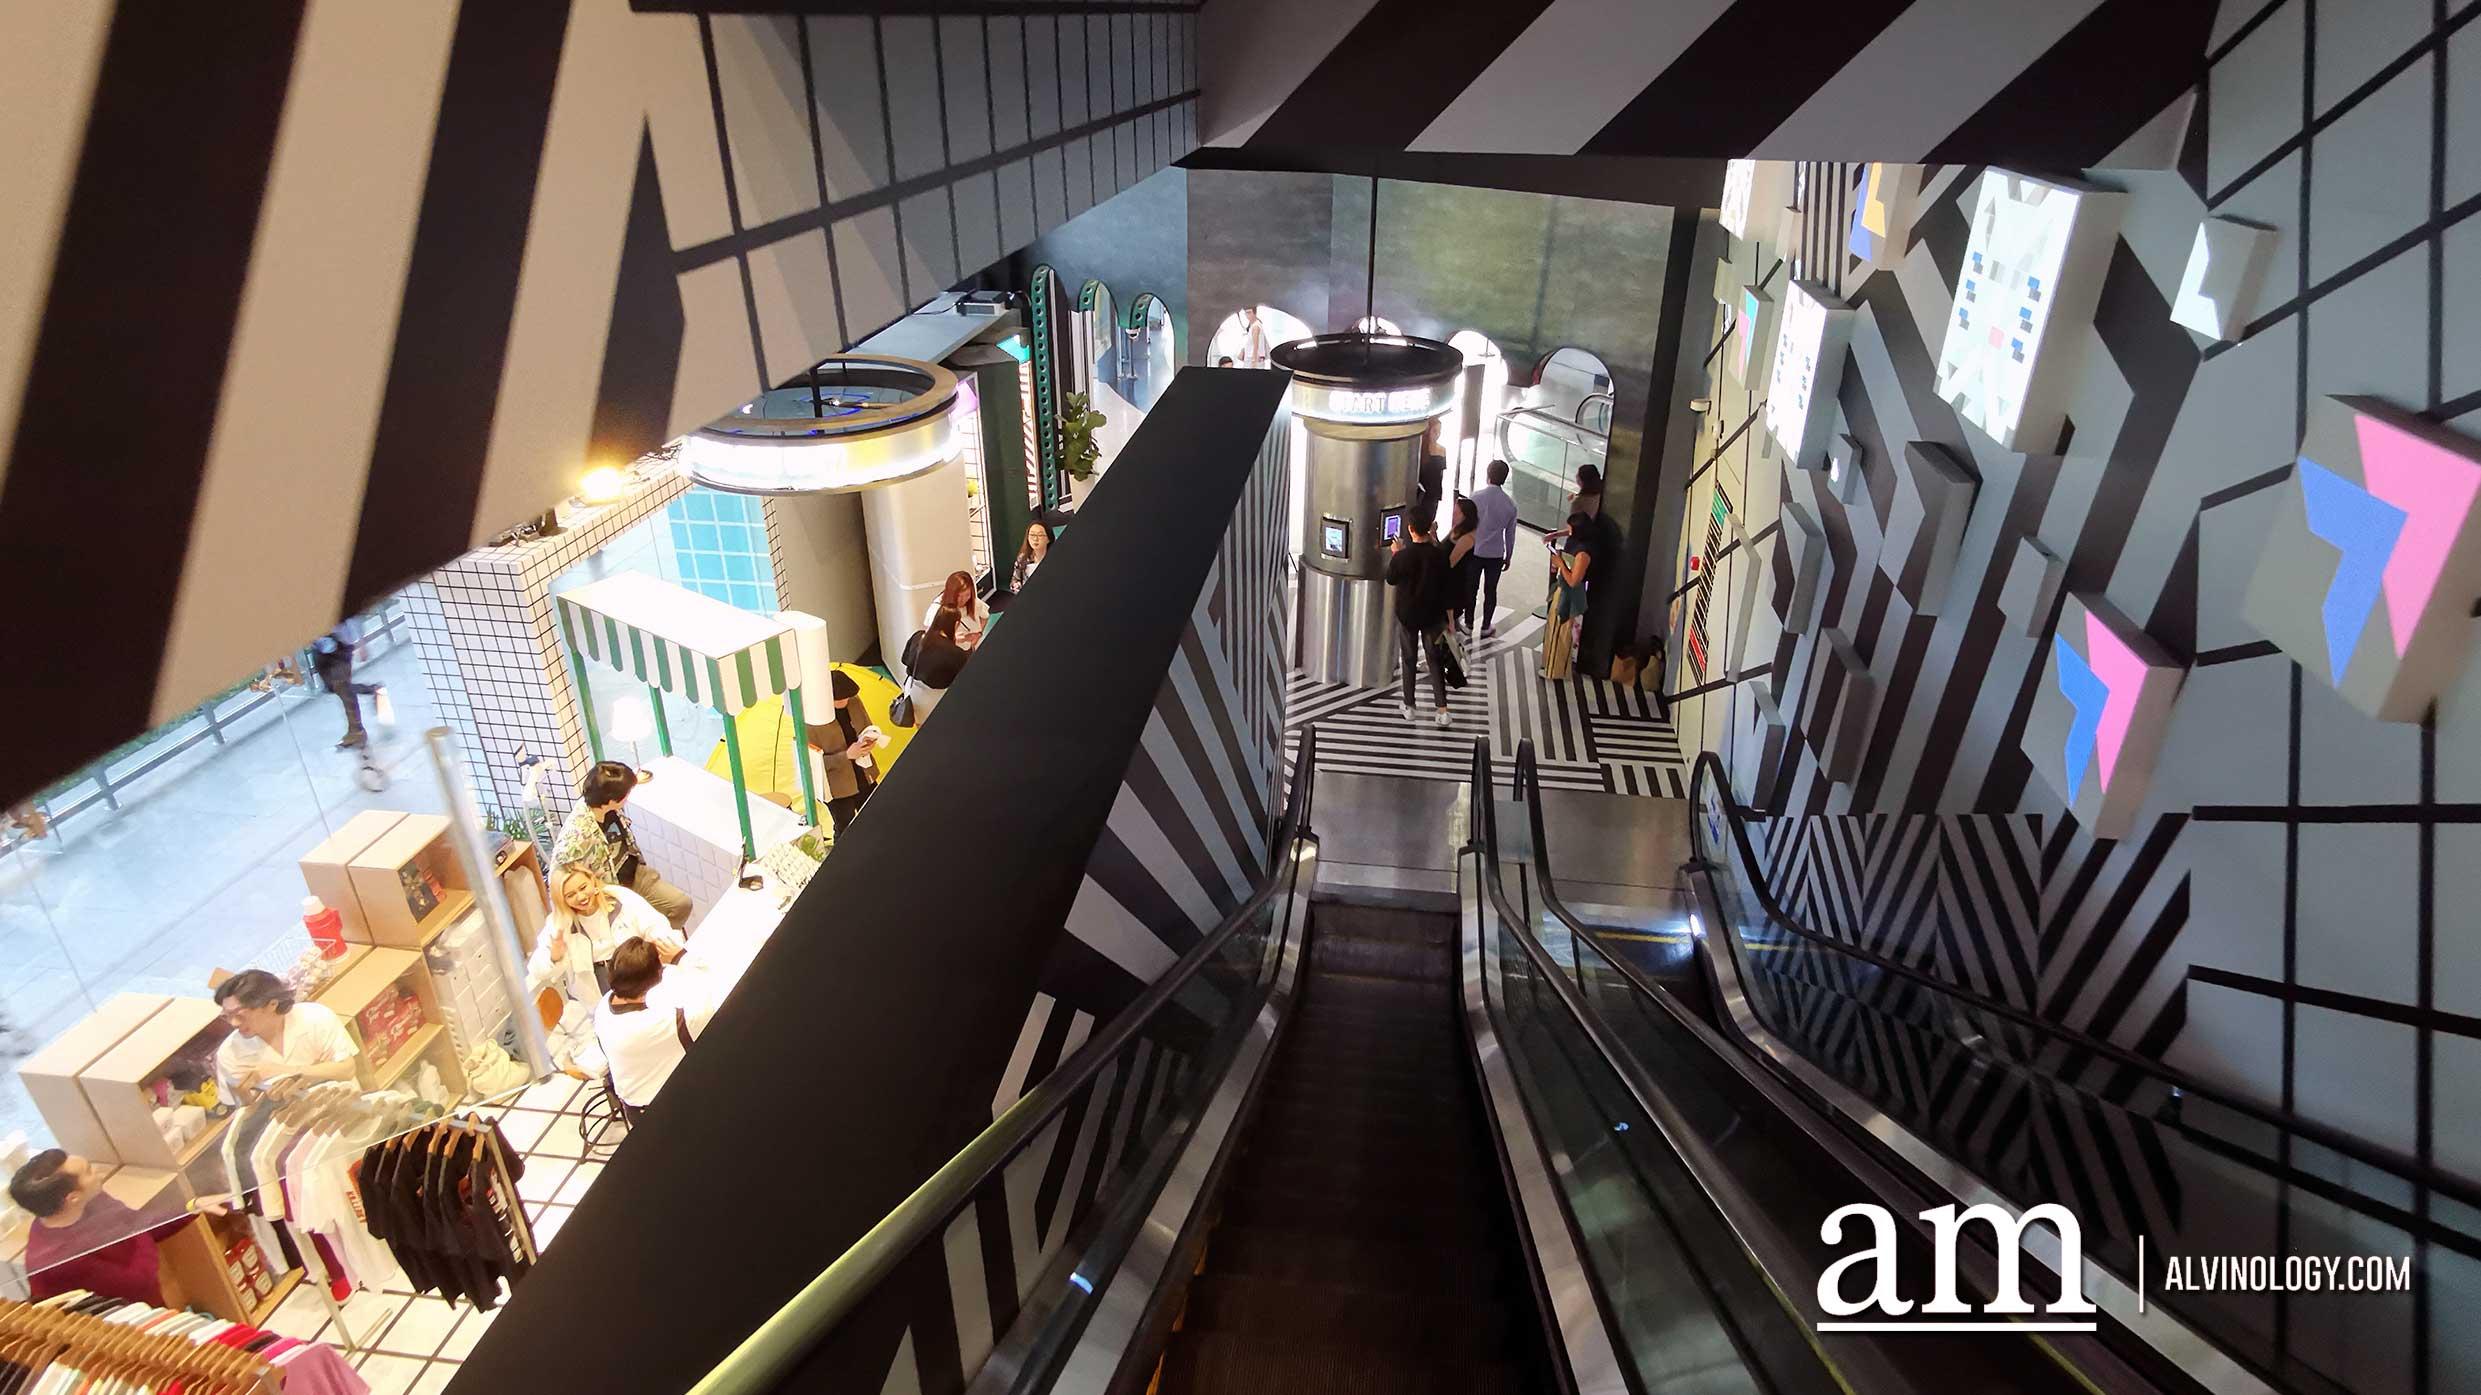 CapitaLand's Nomadx is back and its now open 24/7 via NomadX.sg - Alvinology